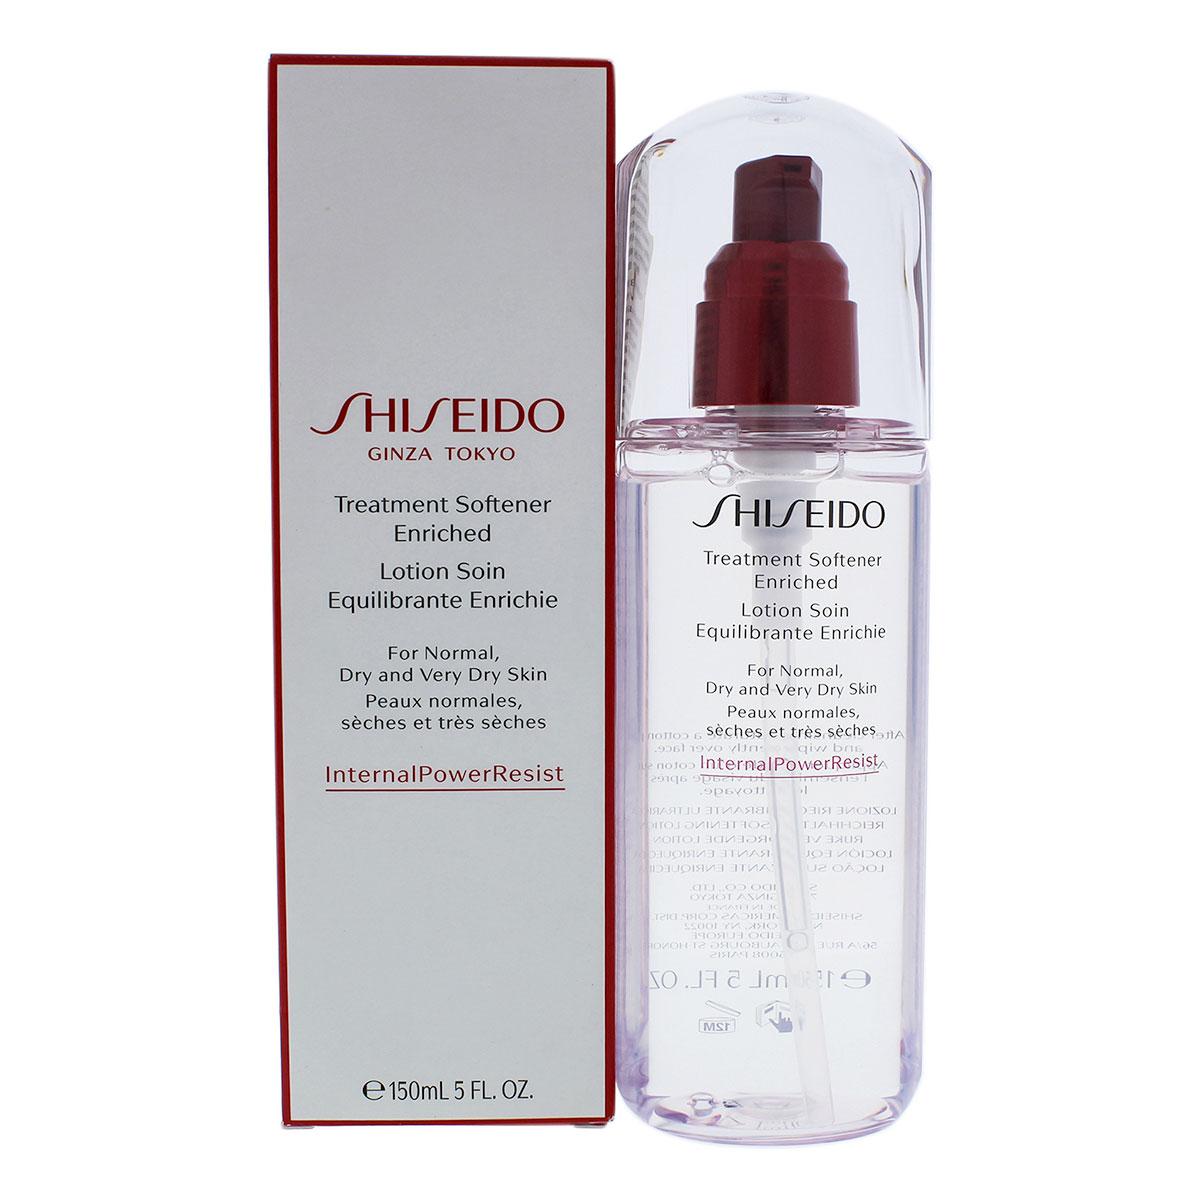 Shiseido Ginza Tokyo Treatment Softener Enriched